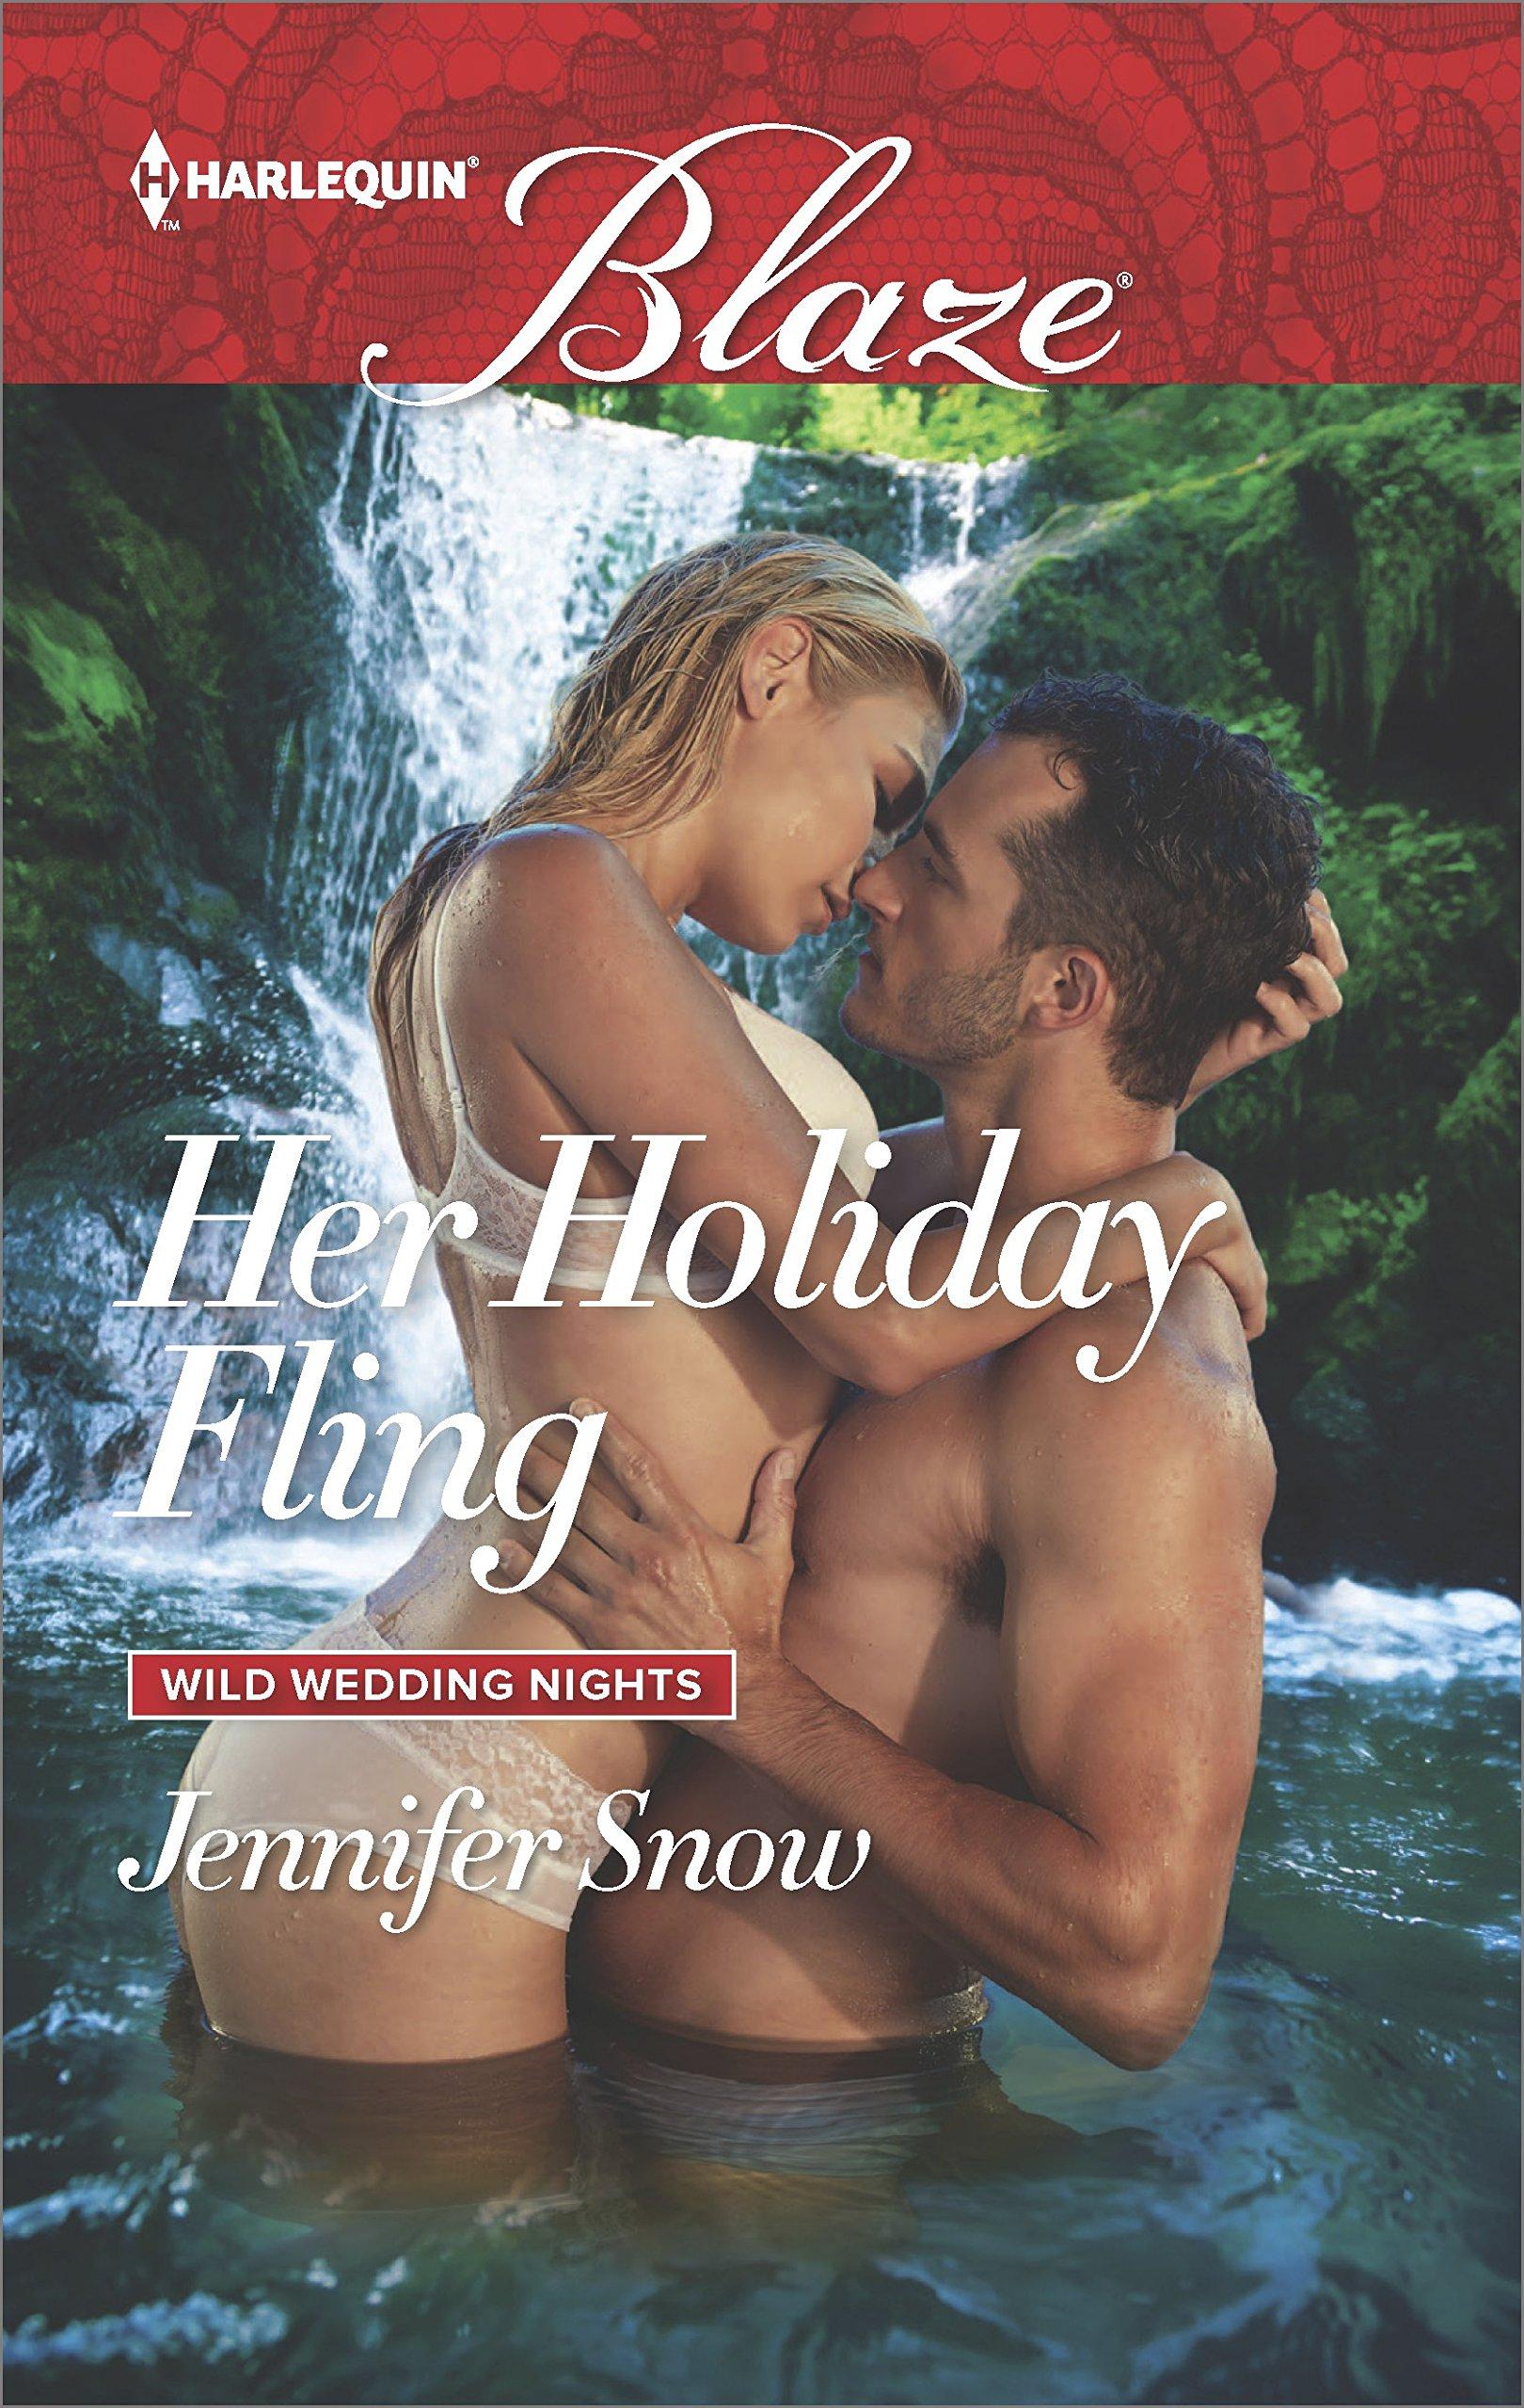 Holiday Fling Wild Wedding Nights product image